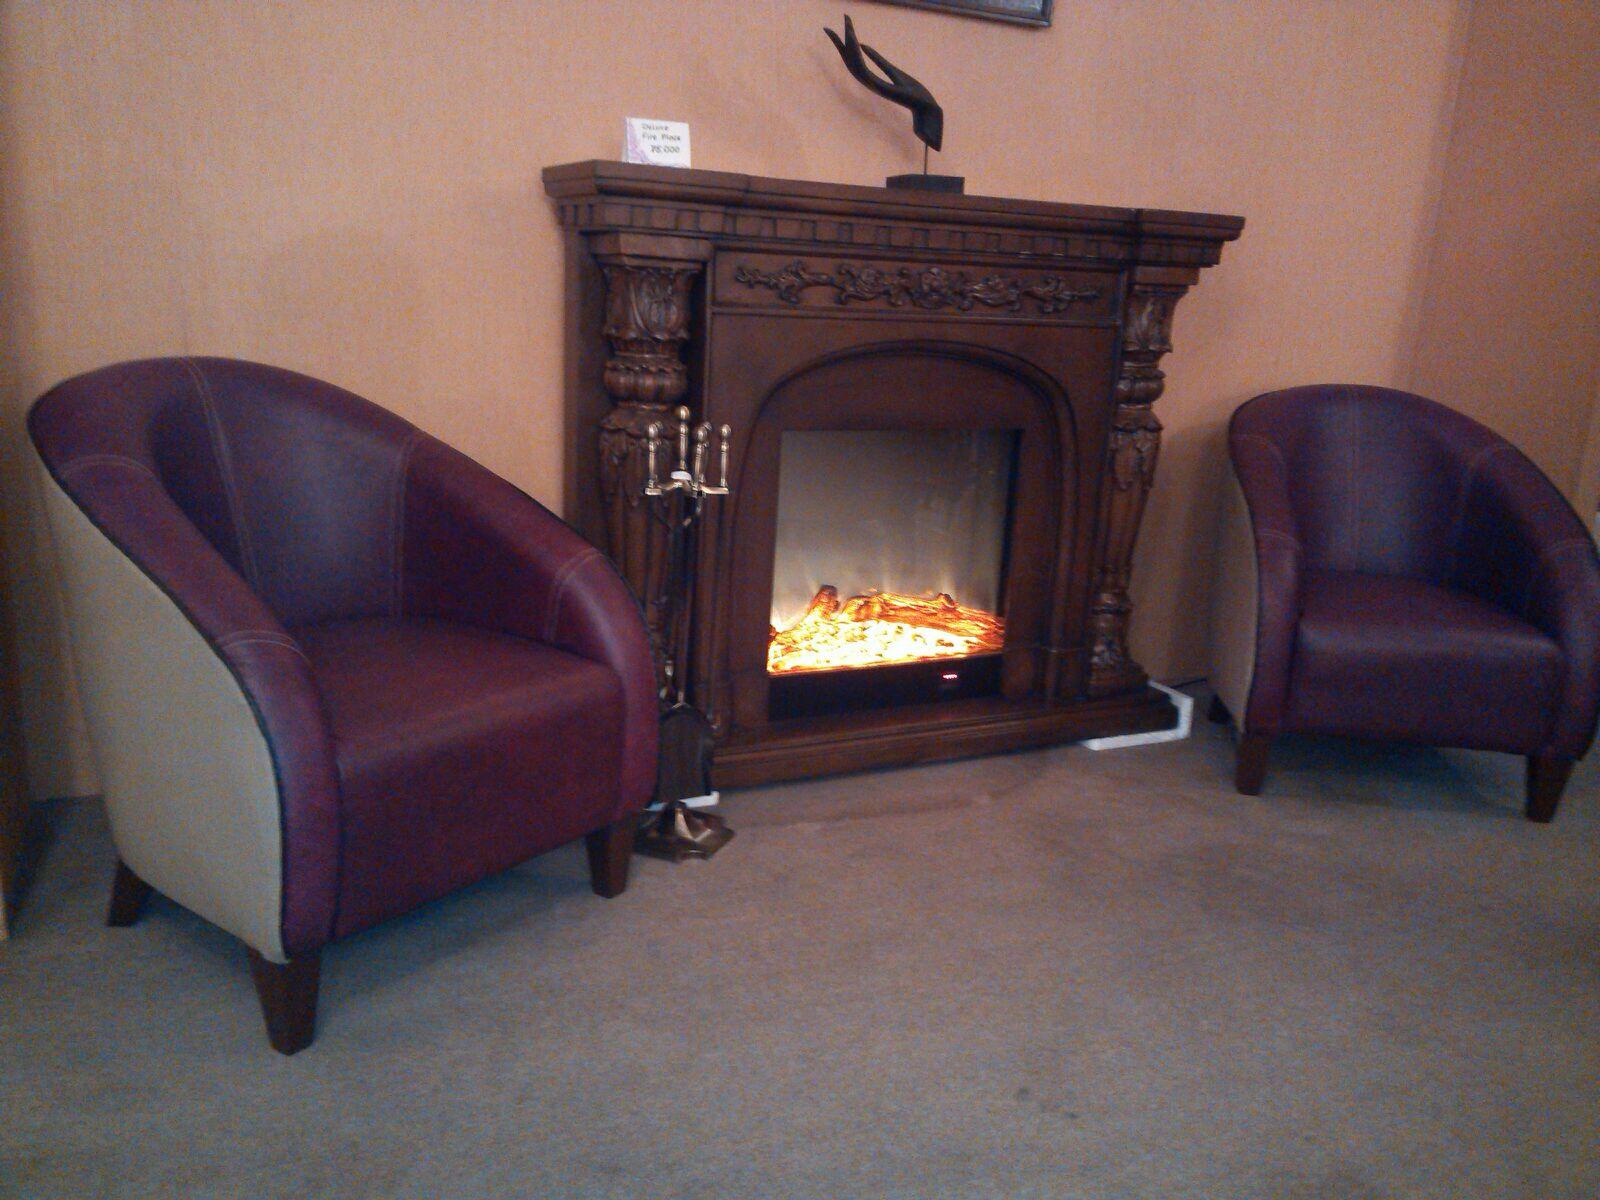 Furniture ChandigarhPanchkulaHaryana Trendz Wooden  : image206 from trendzfurnituremall.com size 1600 x 1200 jpeg 402kB